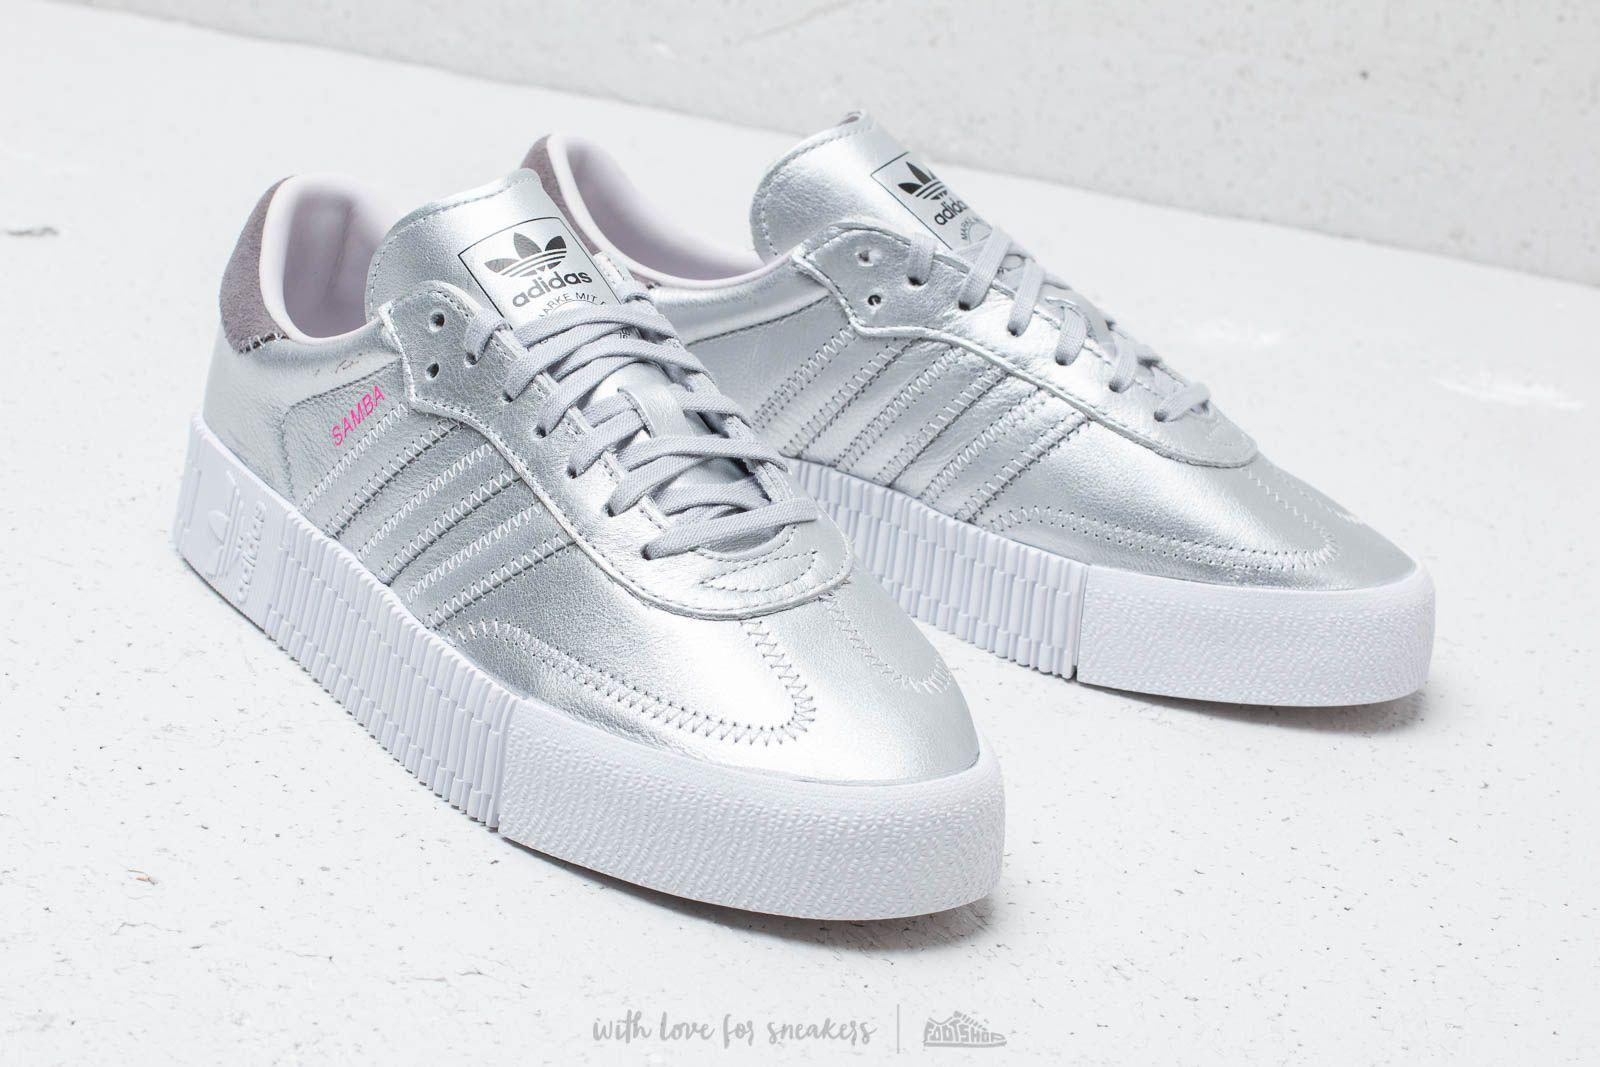 Lyst - adidas Originals Adidas Sambarose W Silver Metallic  Silver ... 5e98a4faf